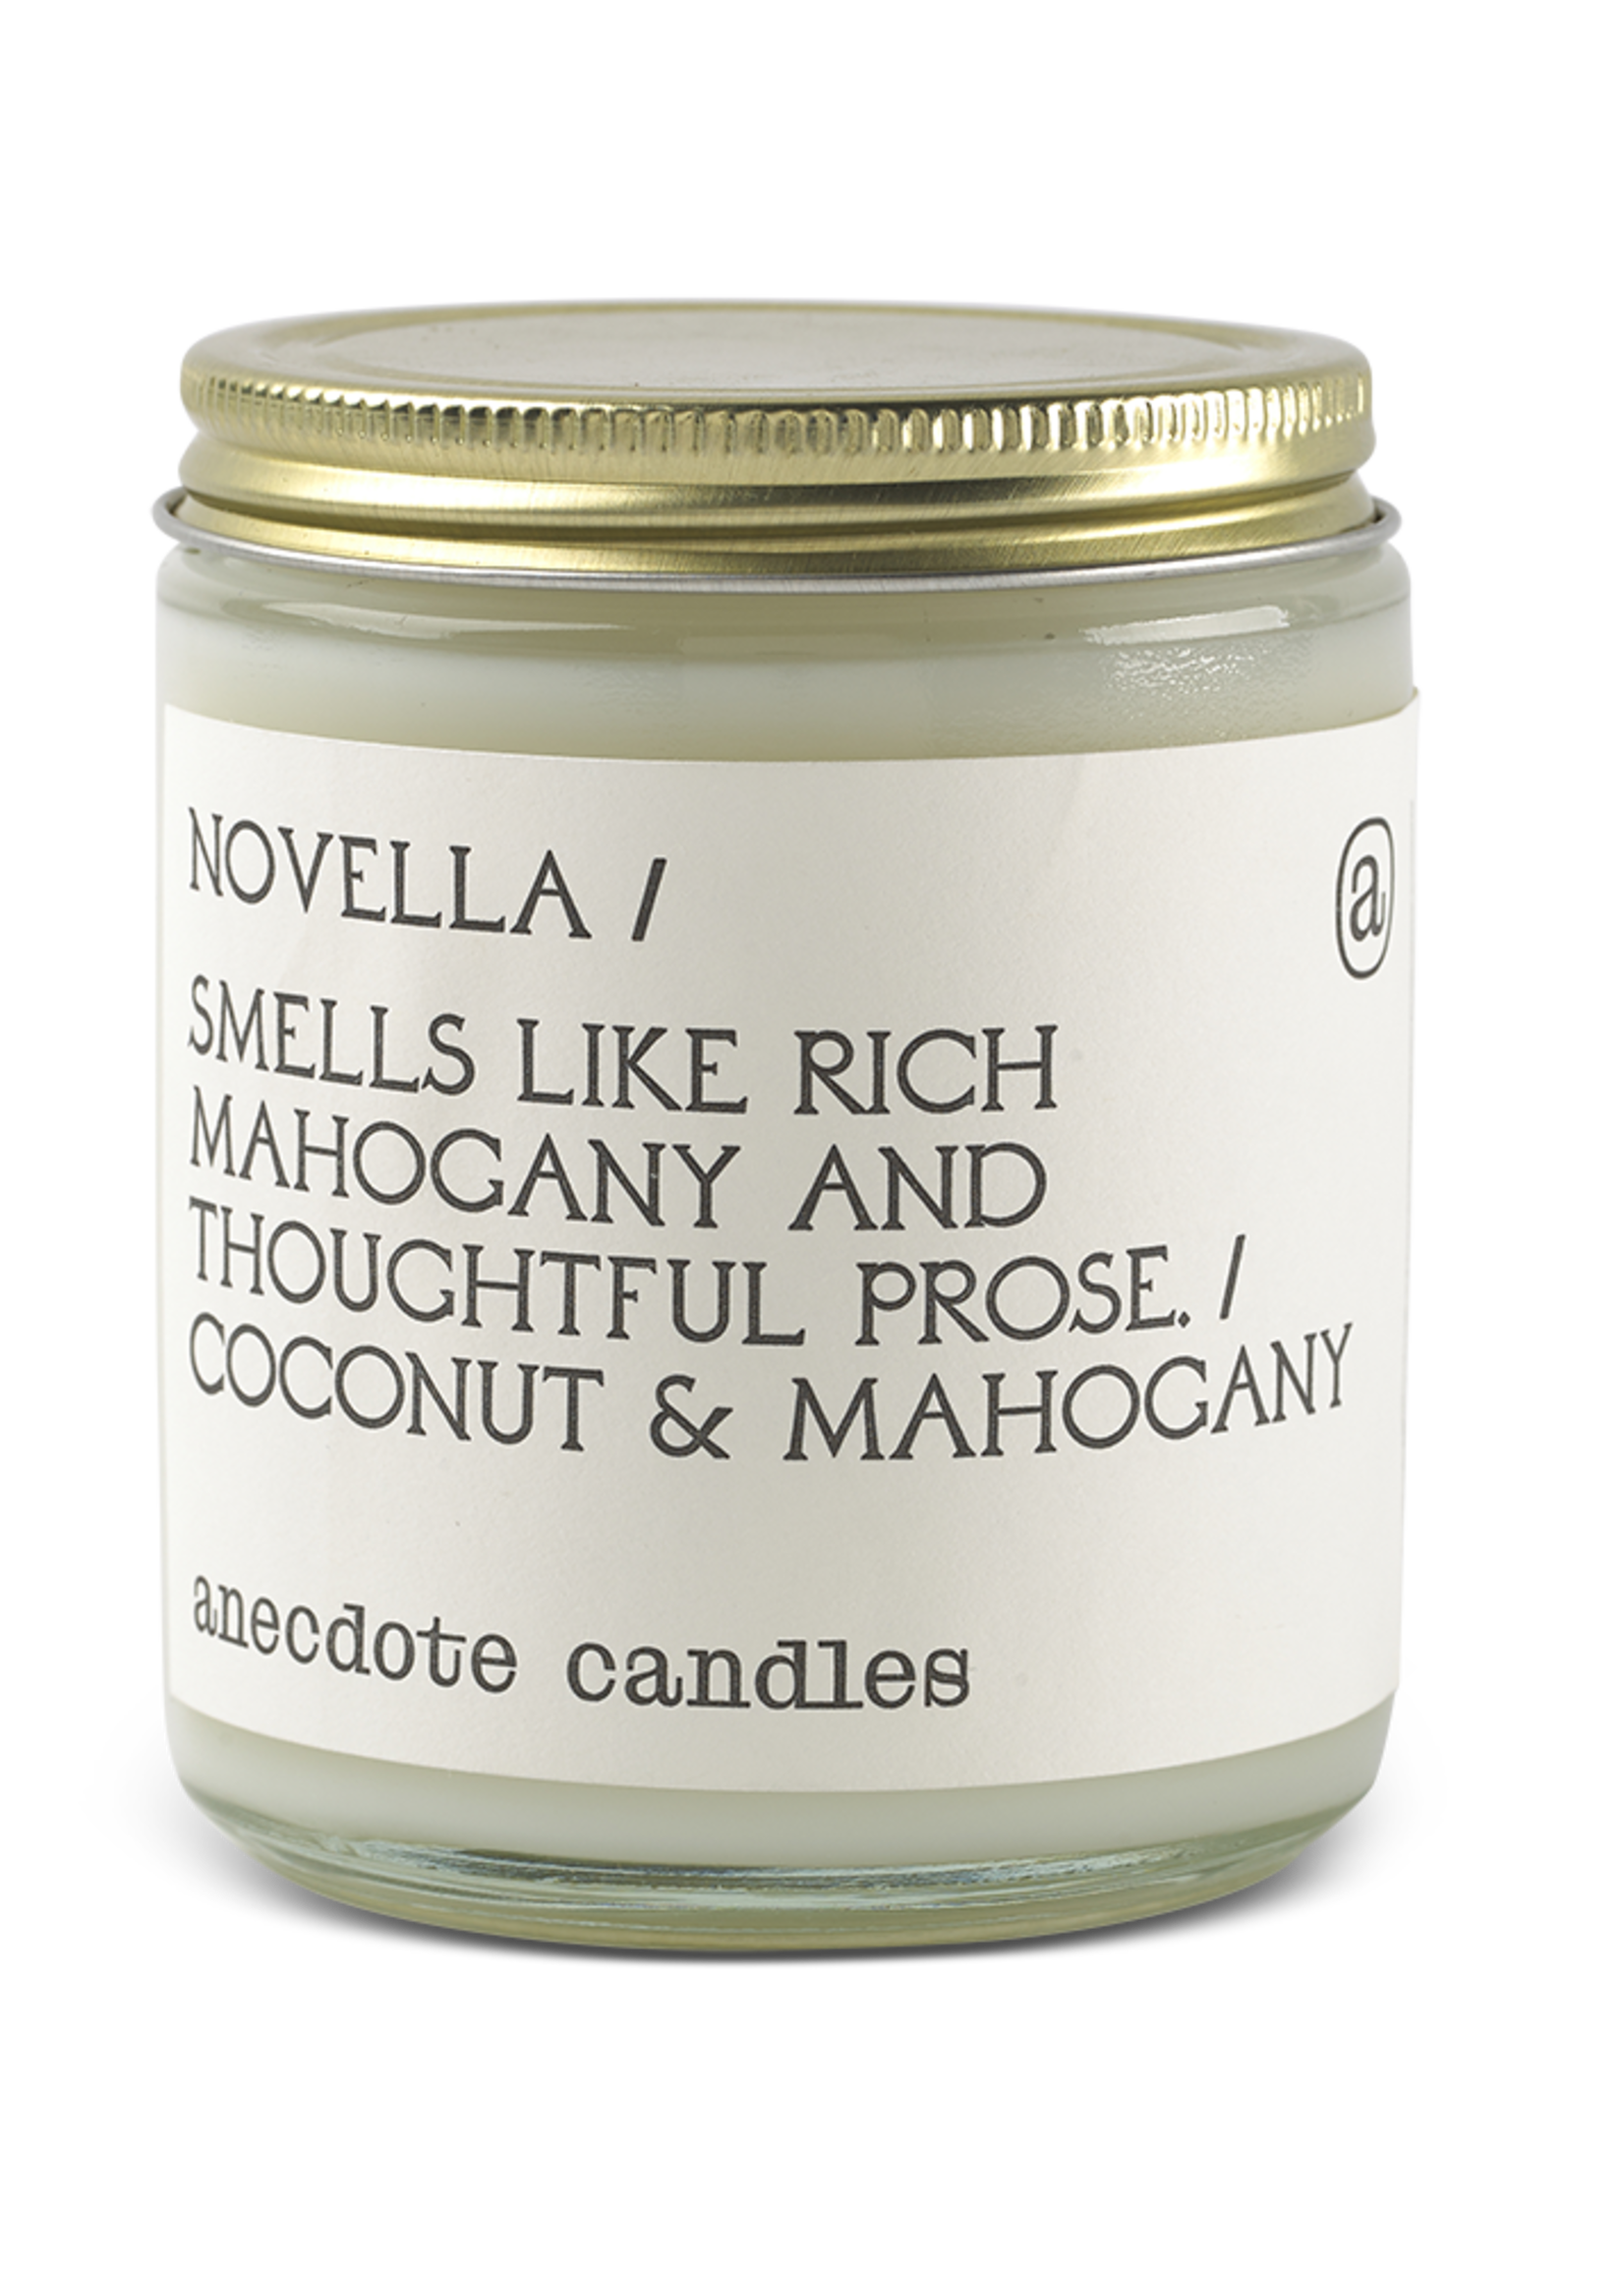 Anecdote Candles Novella (Mahogany & Coconut) Glass Jar Candle